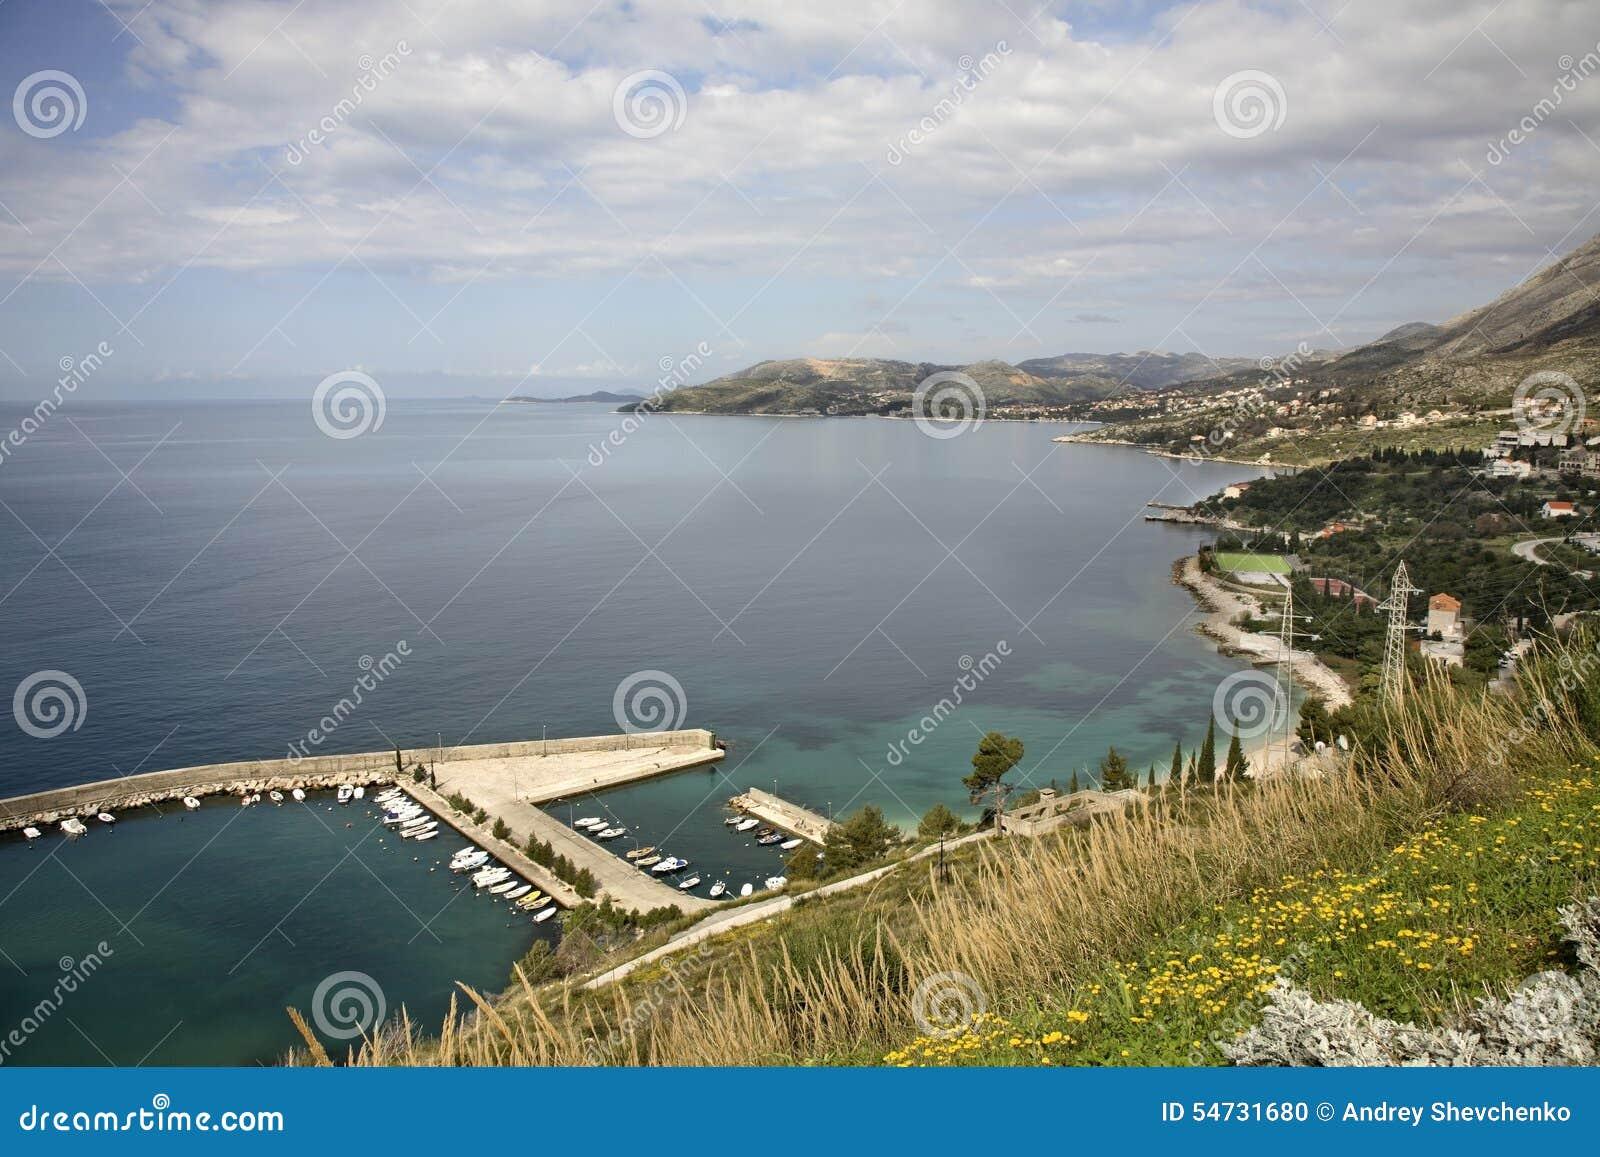 El mar adriático cerca Plat dalmatia Croacia